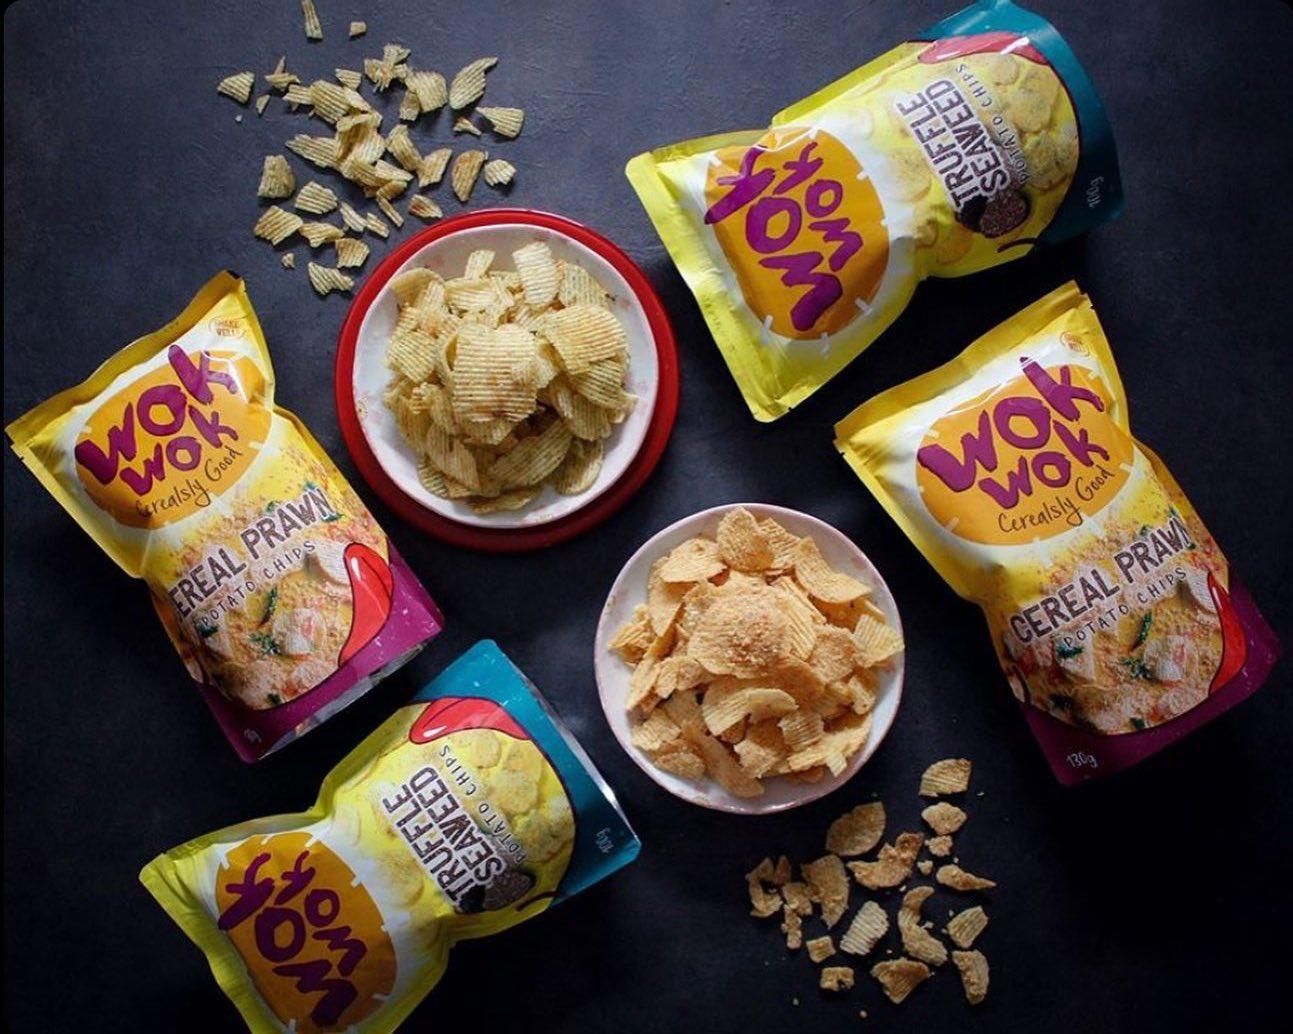 capitol-chijmes-national-day - wok wok snacks